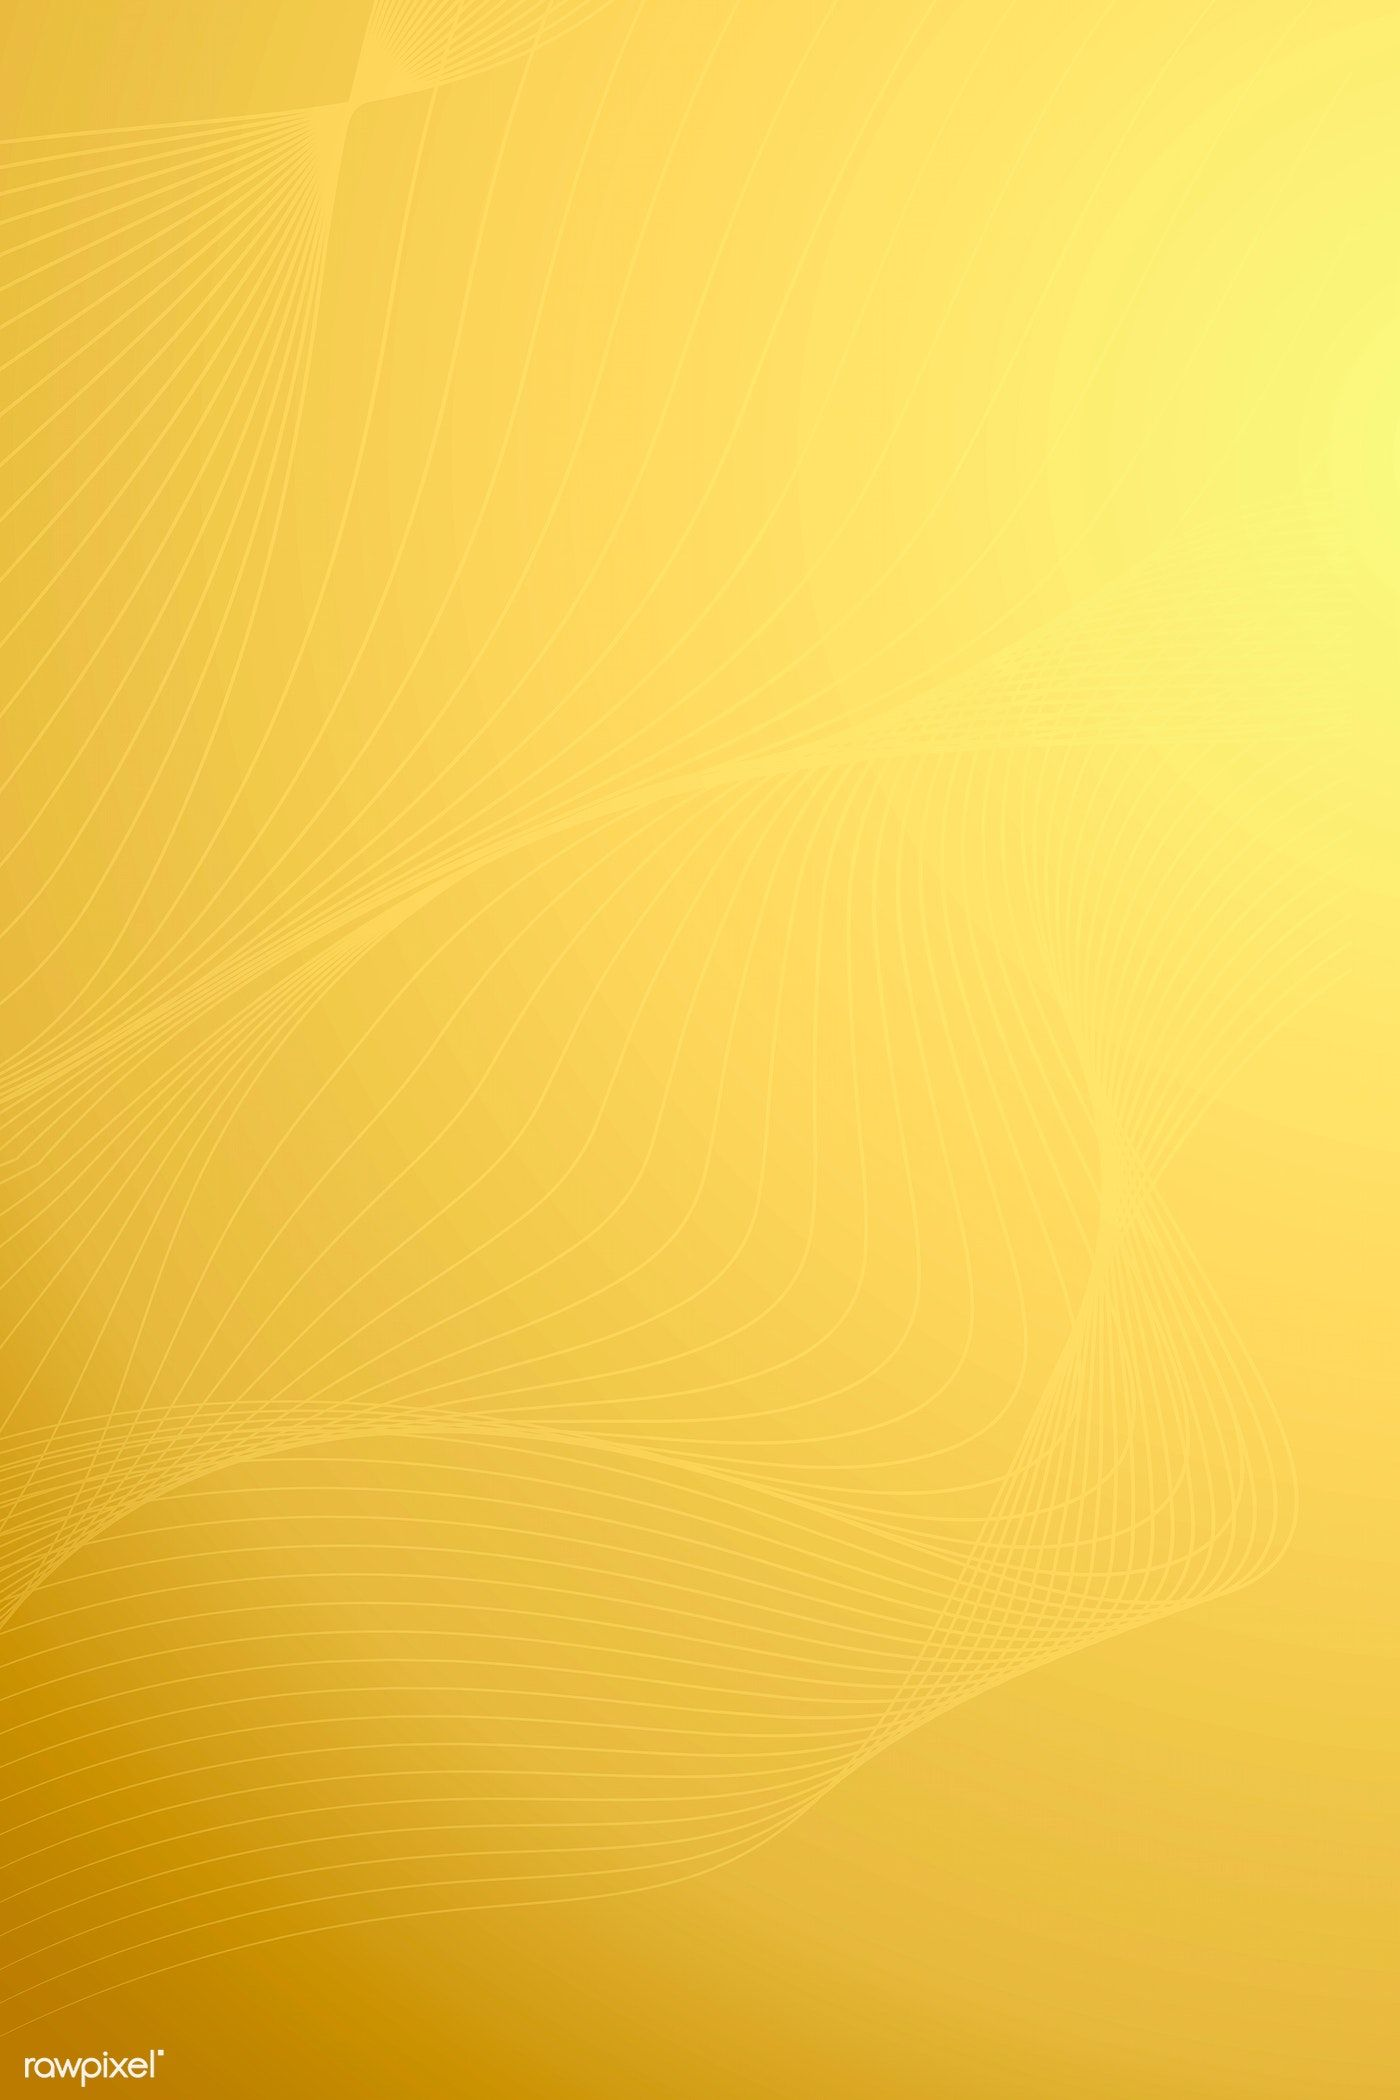 Download Premium Illustration Of Abstract Gold Metallic Background Design Background Design Free Illustrations Background